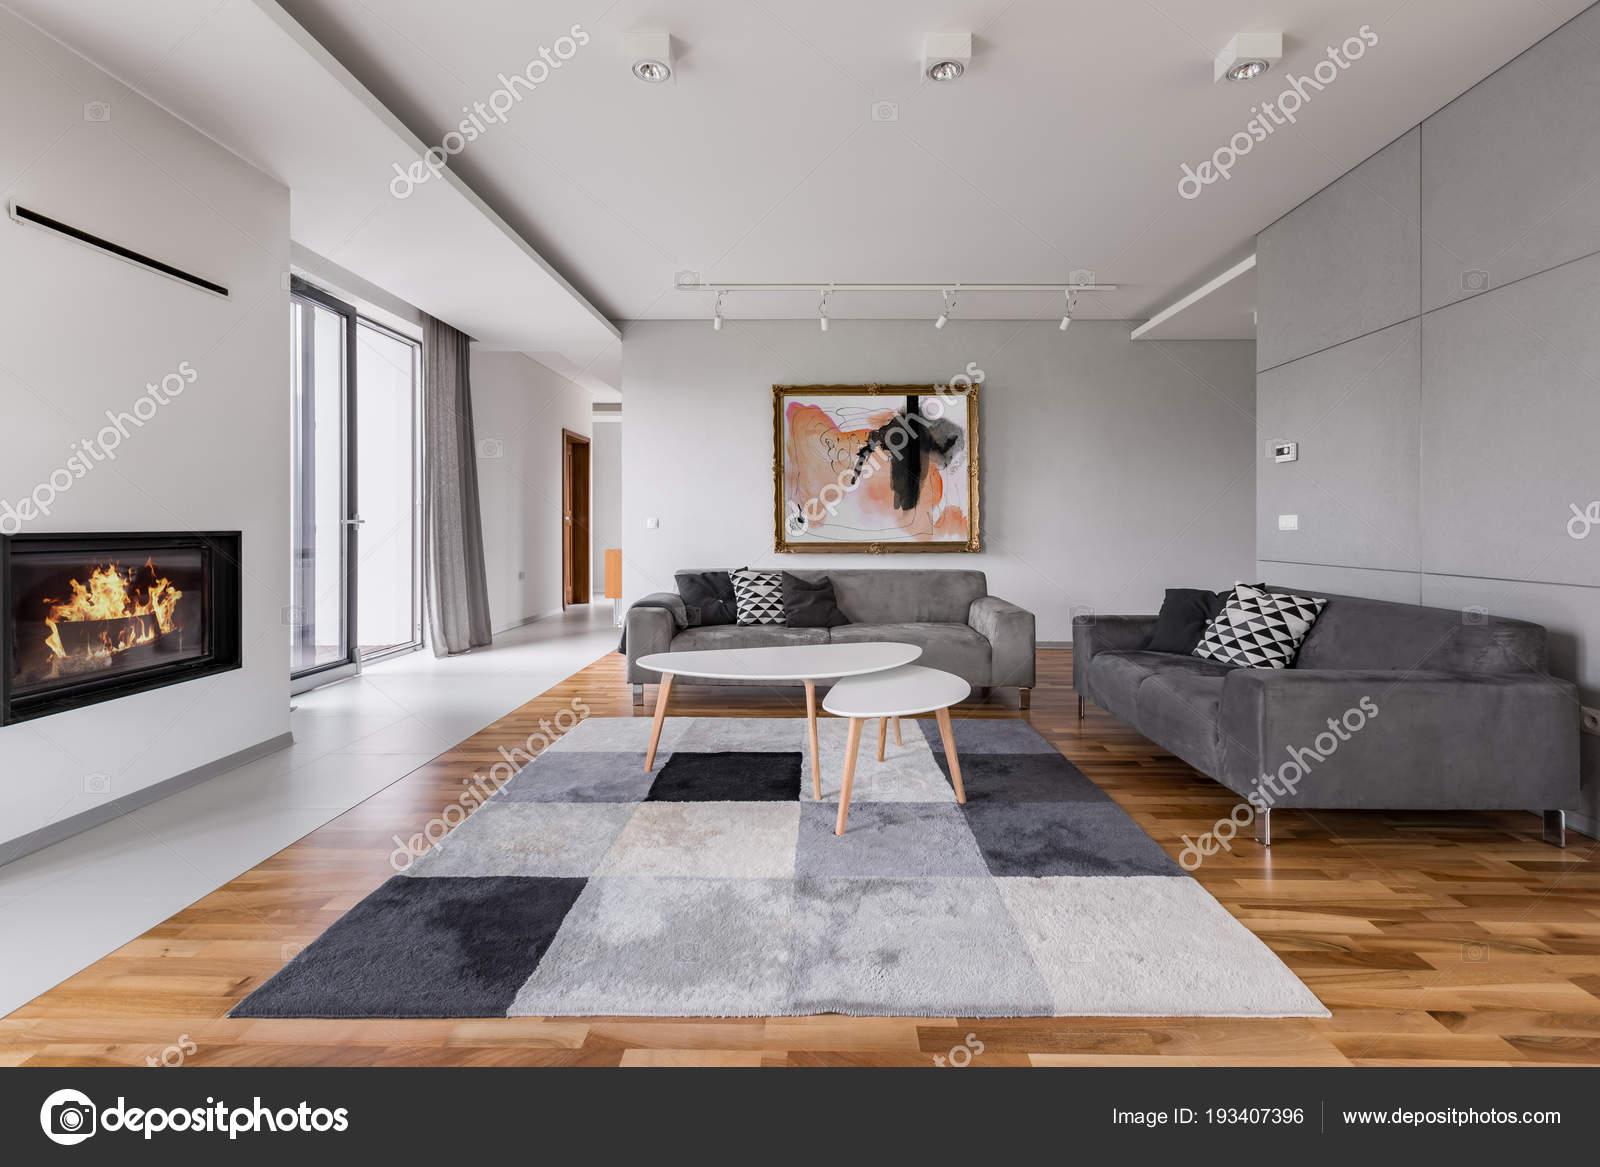 Villa-woonkamer met open haard — Stockfoto © in4mal #193407396